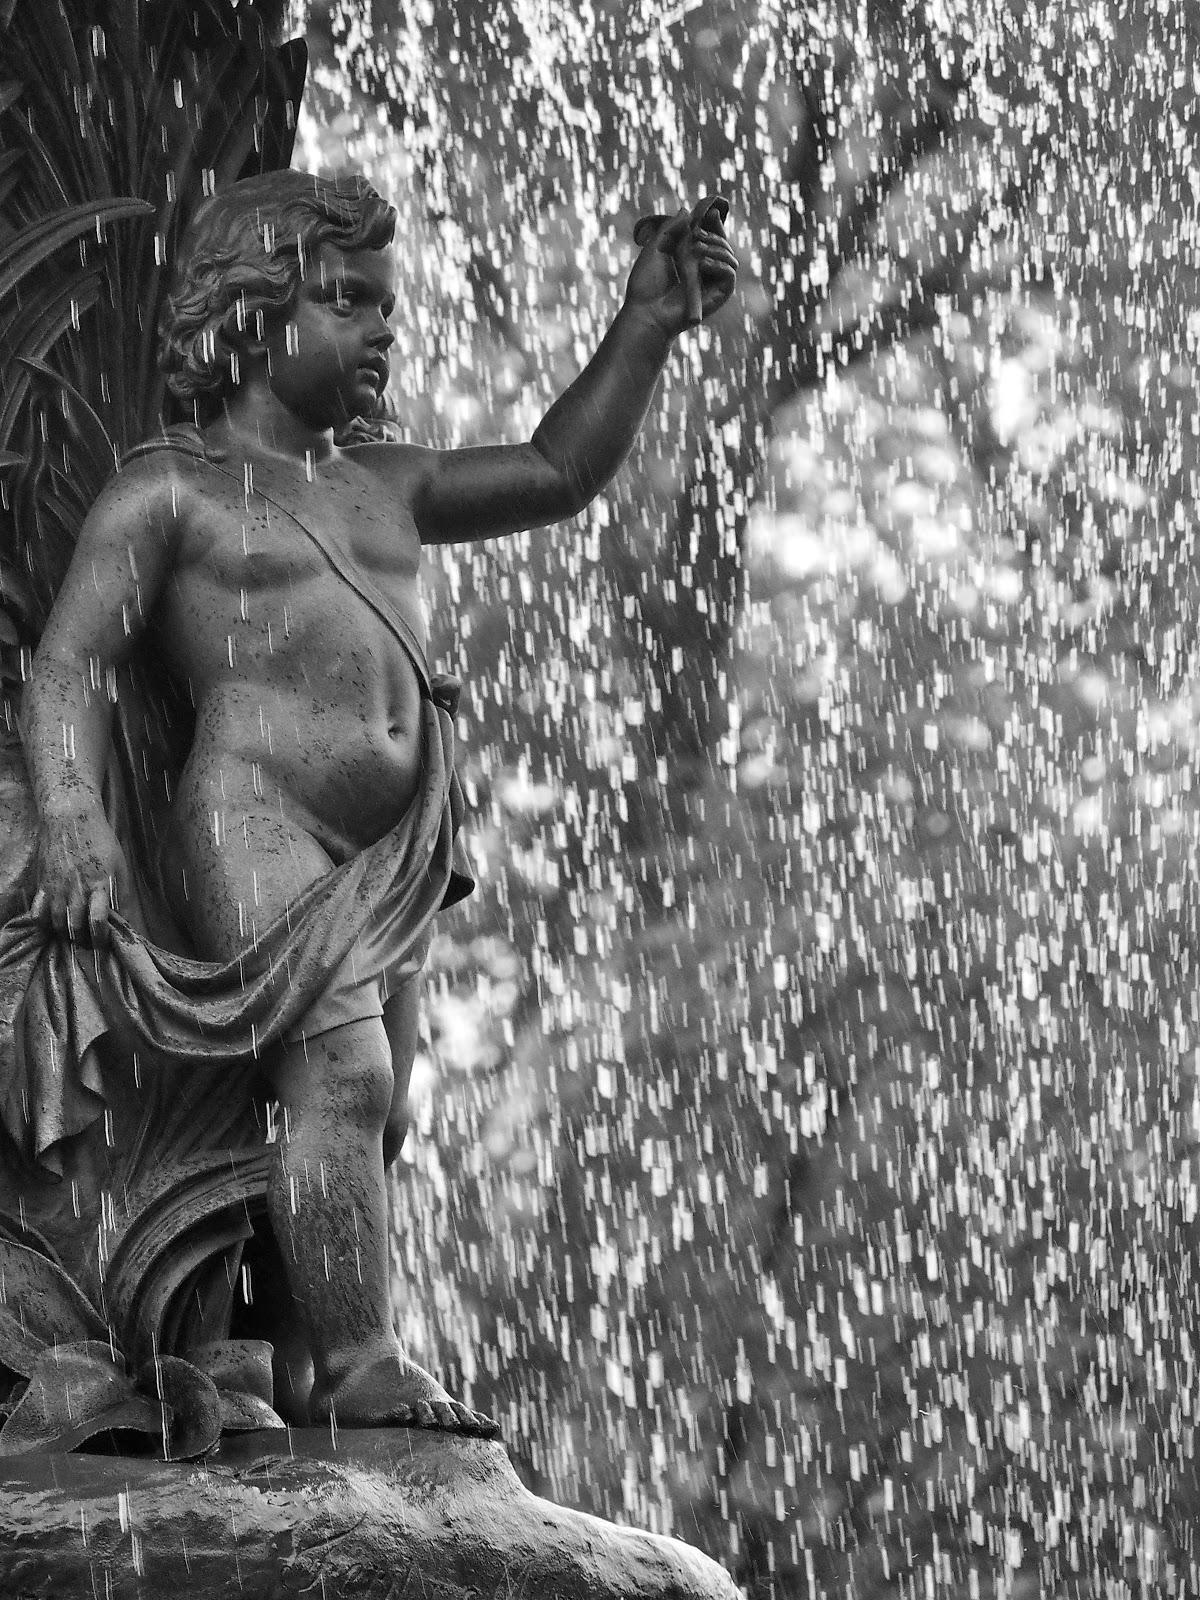 Bethesda Cherub, #bethesdacherub #centralpark #bethesdafountain #fountain 2014